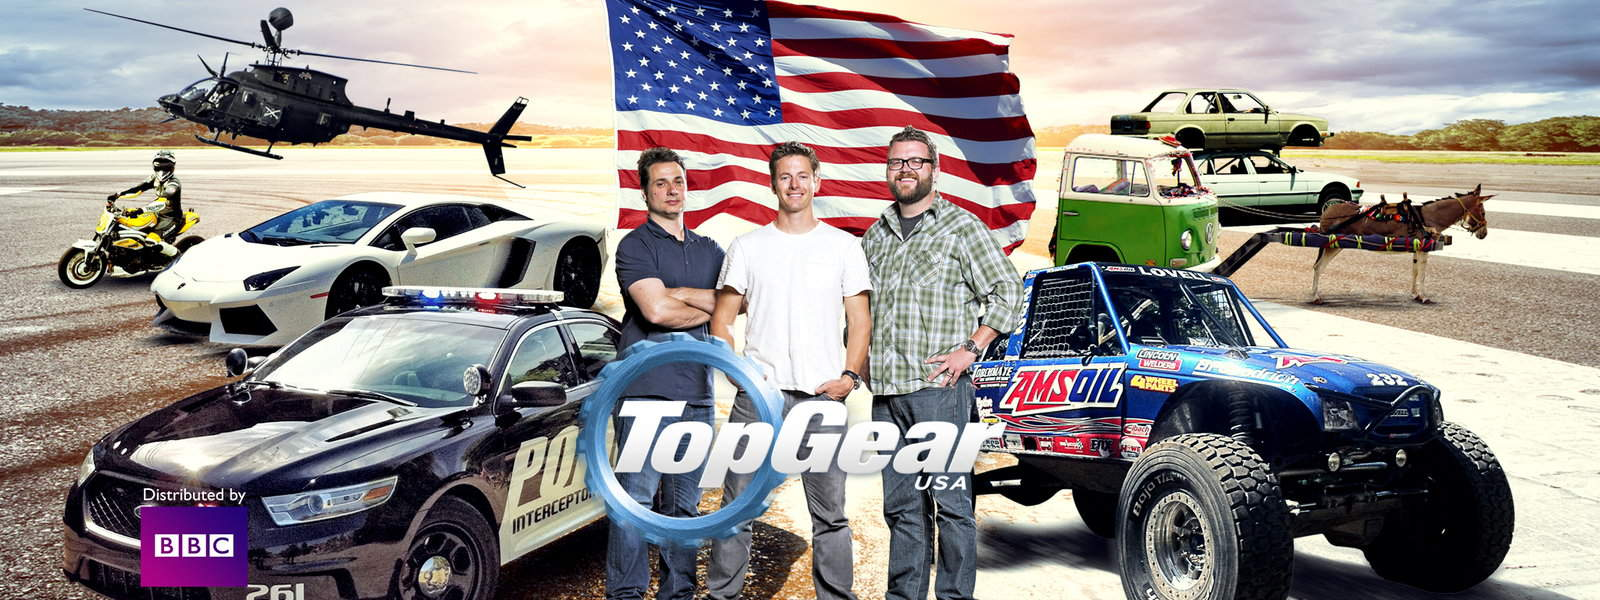 TopGear USA